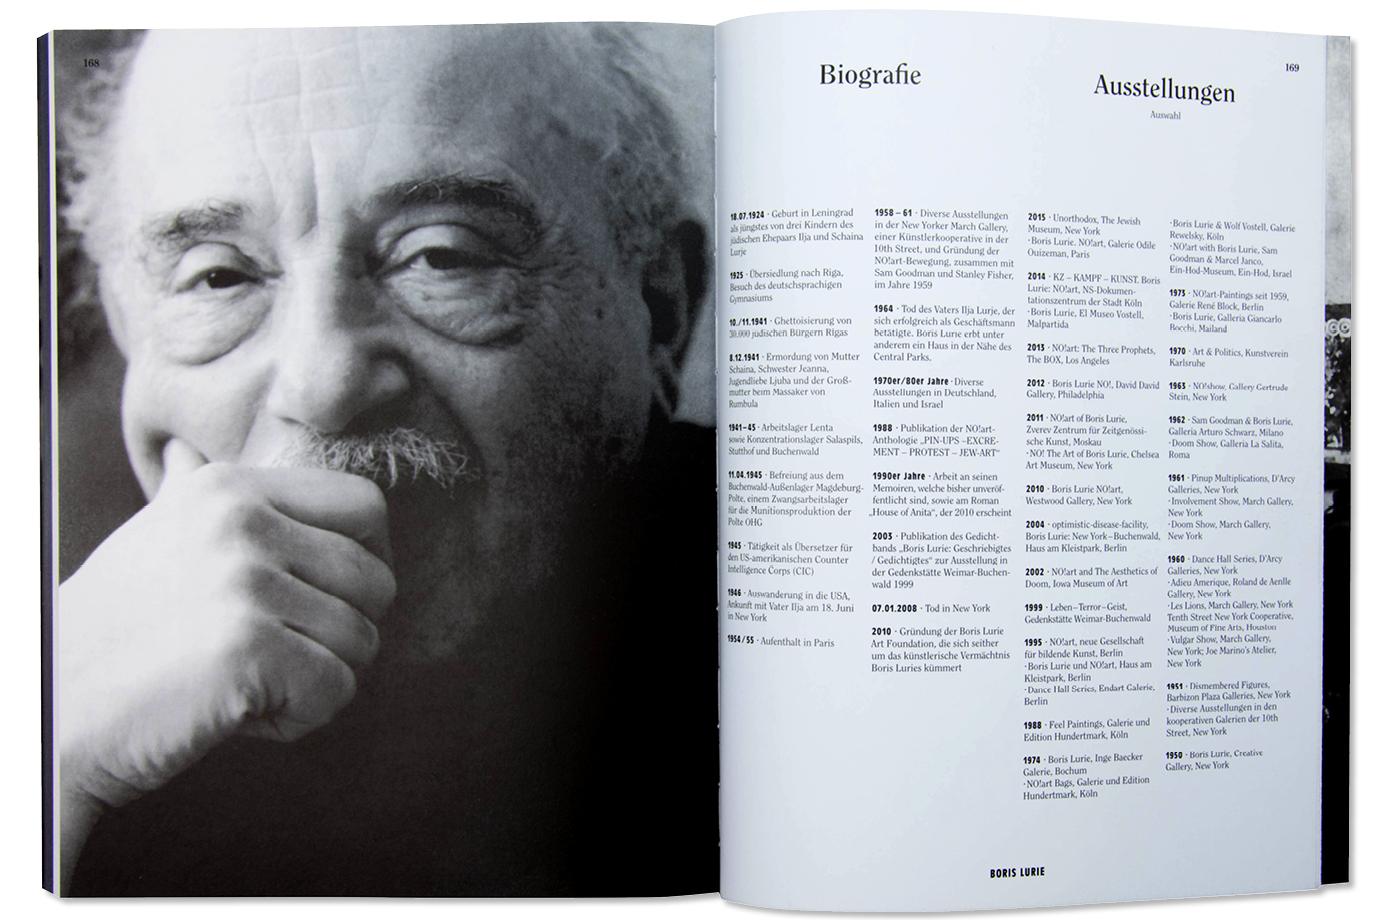 http://e-o-t.de/wordpress/wp-content/uploads/2017/03/Slide-Book_Lurie_8.jpg